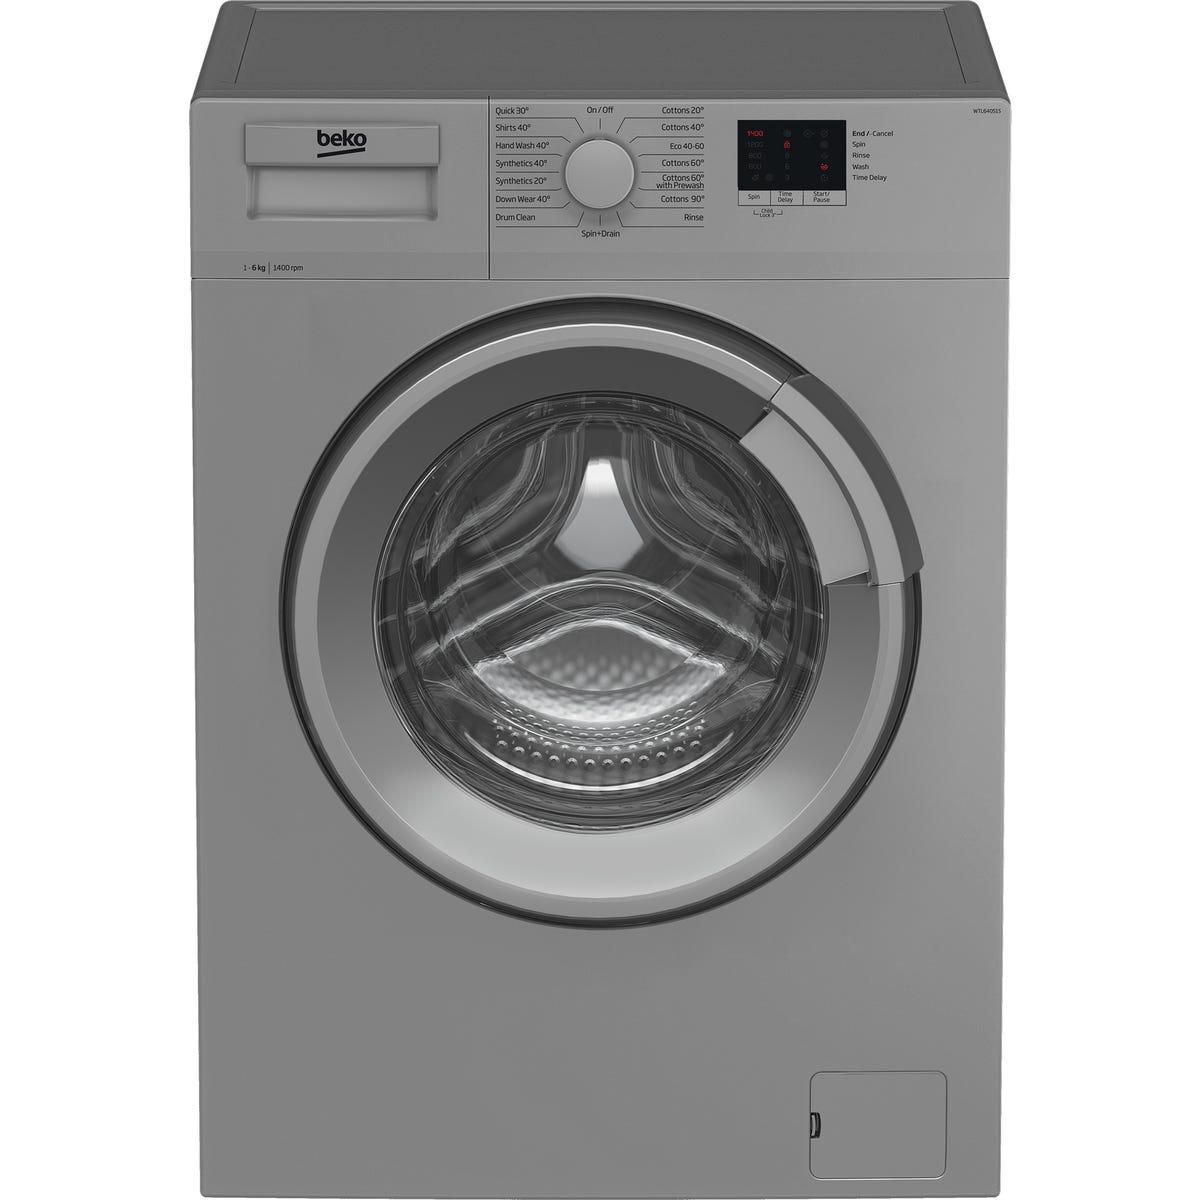 Beko WTL64051S 6kg 1400rpm Freestanding Washing Machine - Silver